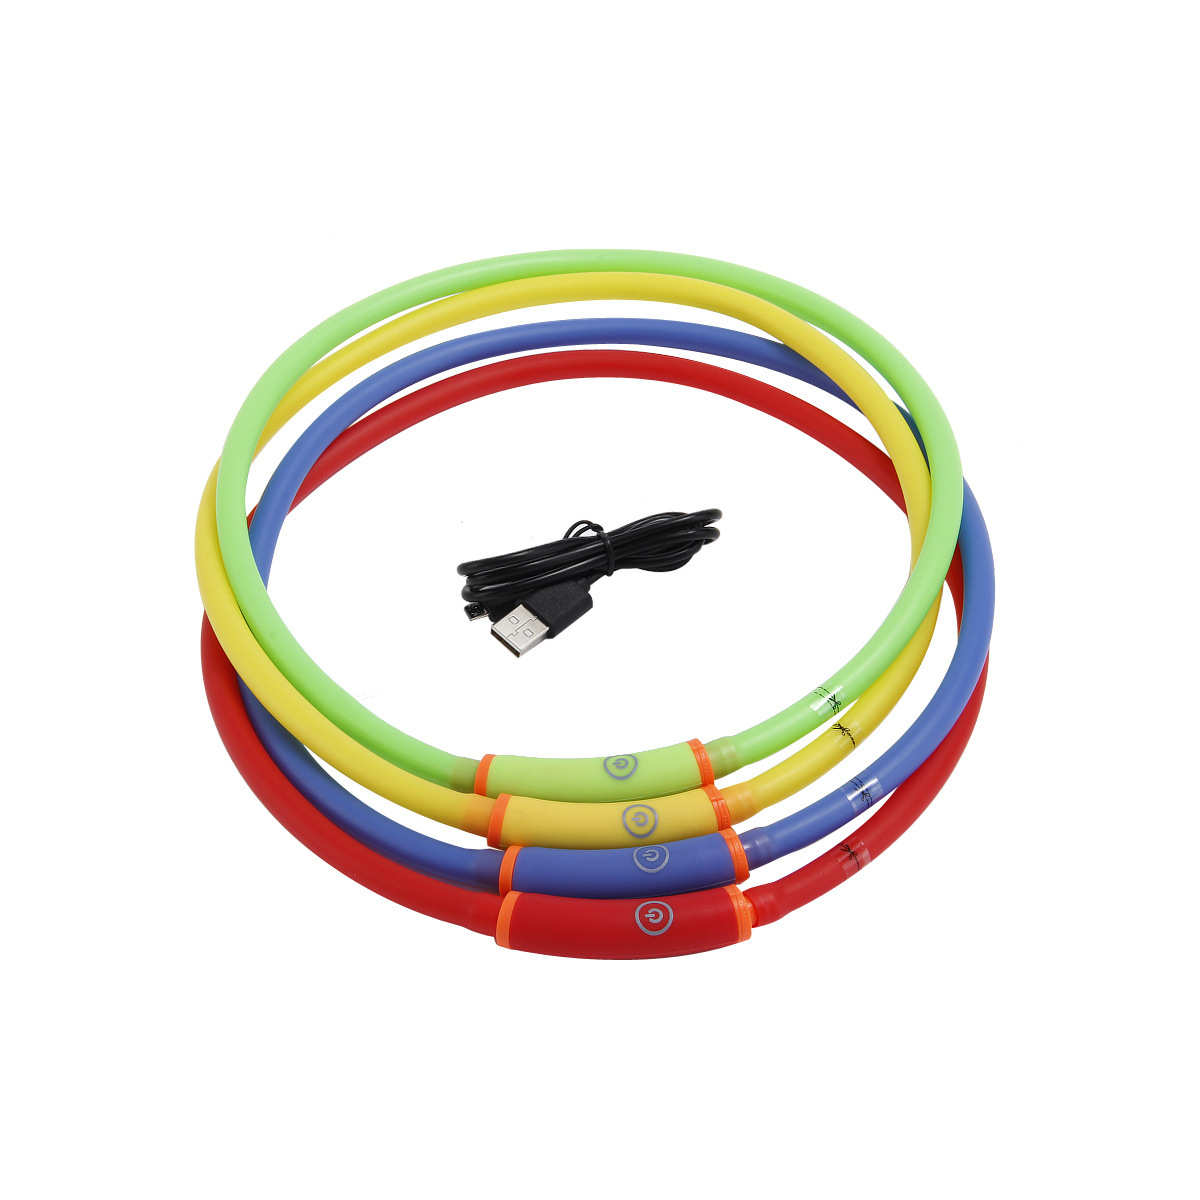 Waterproof LED Shining Dog Neck Ring Pet Collar New Style Pet Supplies Luminous Collar